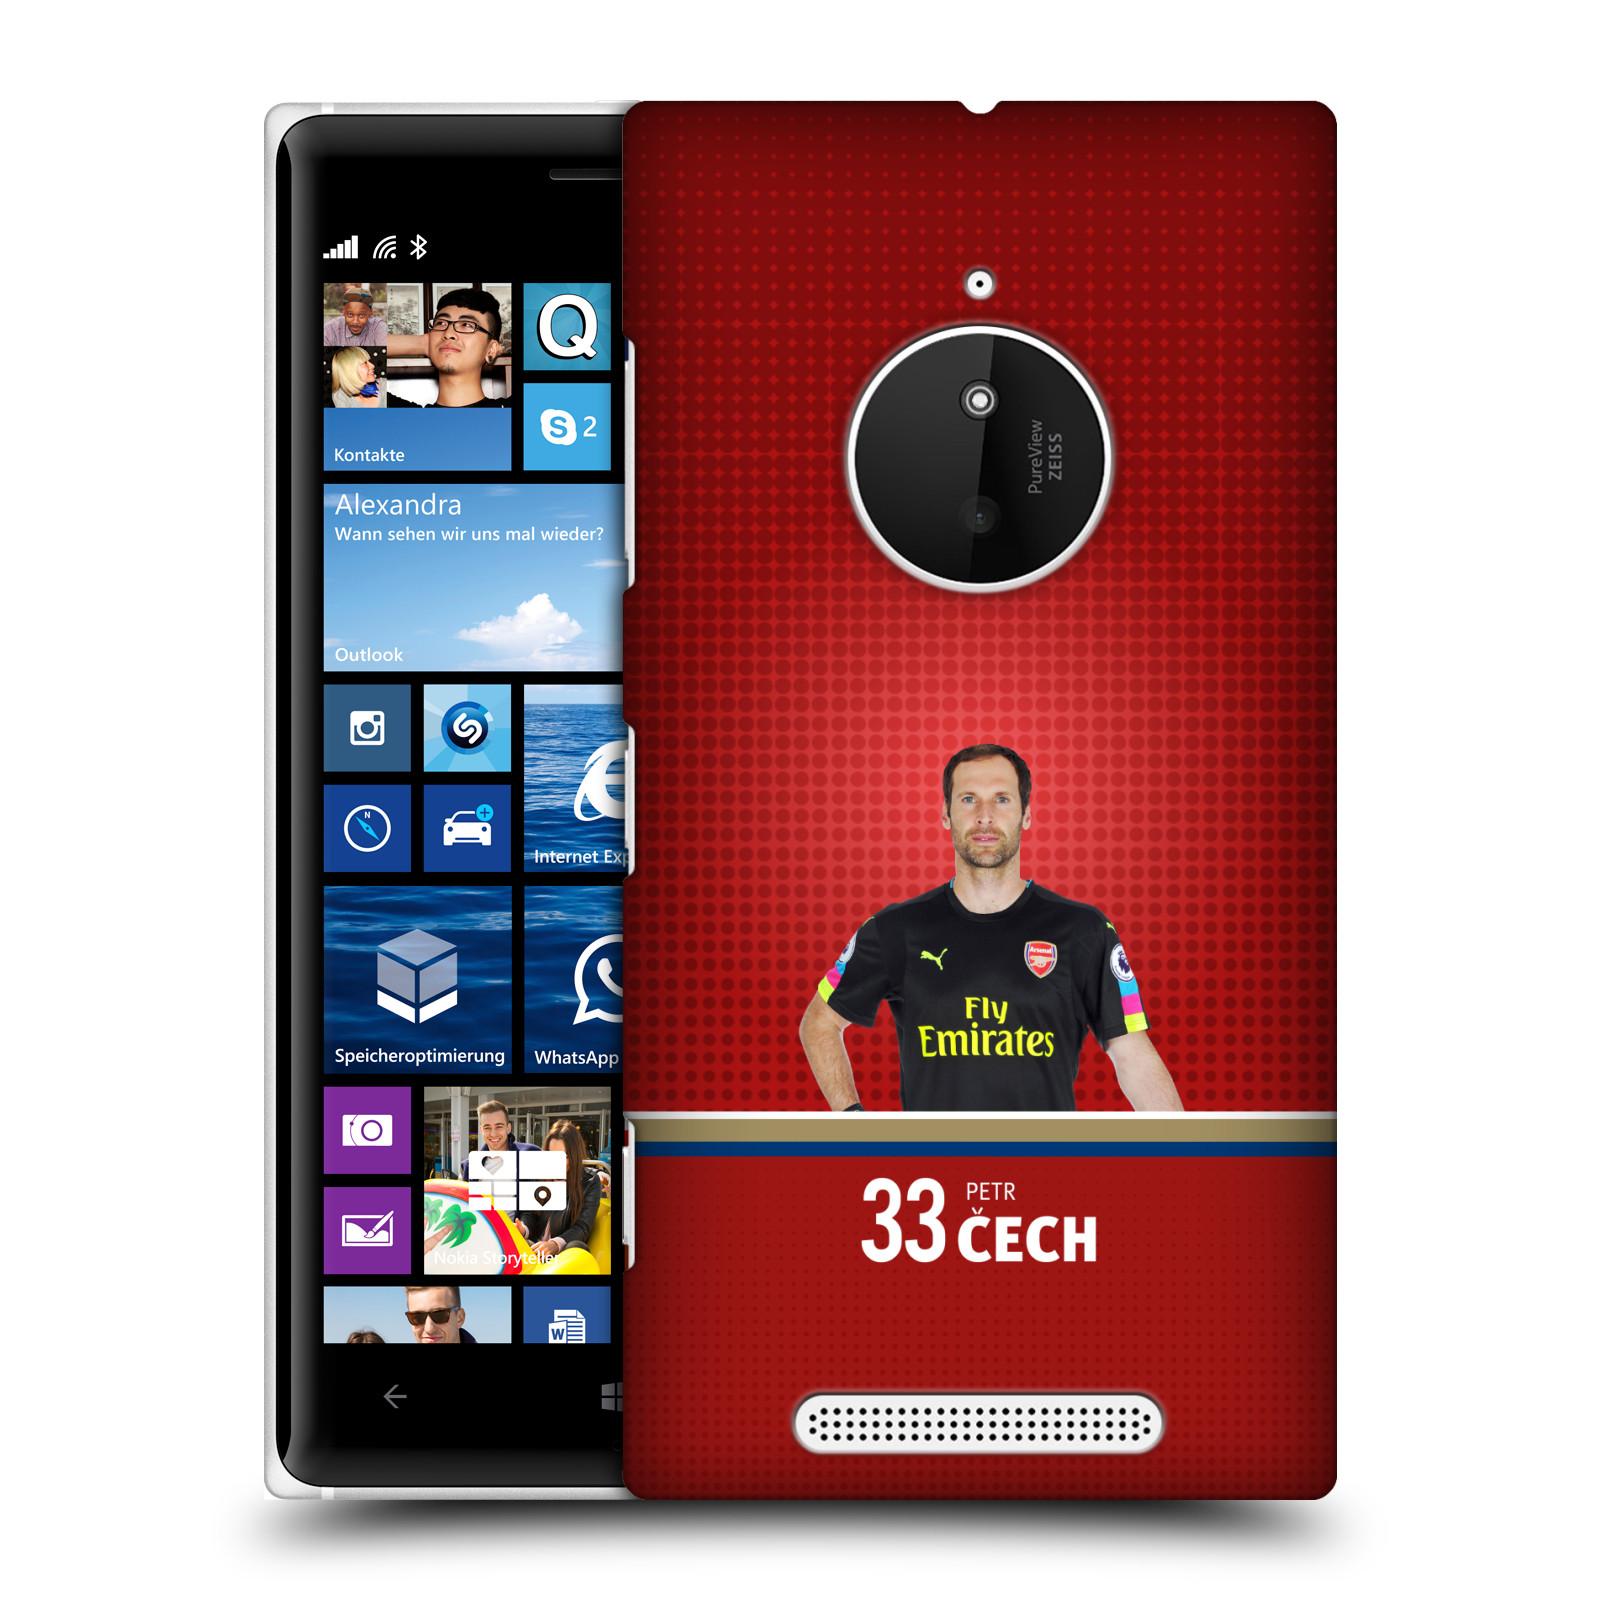 Plastové pouzdro na mobil Nokia Lumia 830 - Head Case - Arsenal FC - Petr Čech